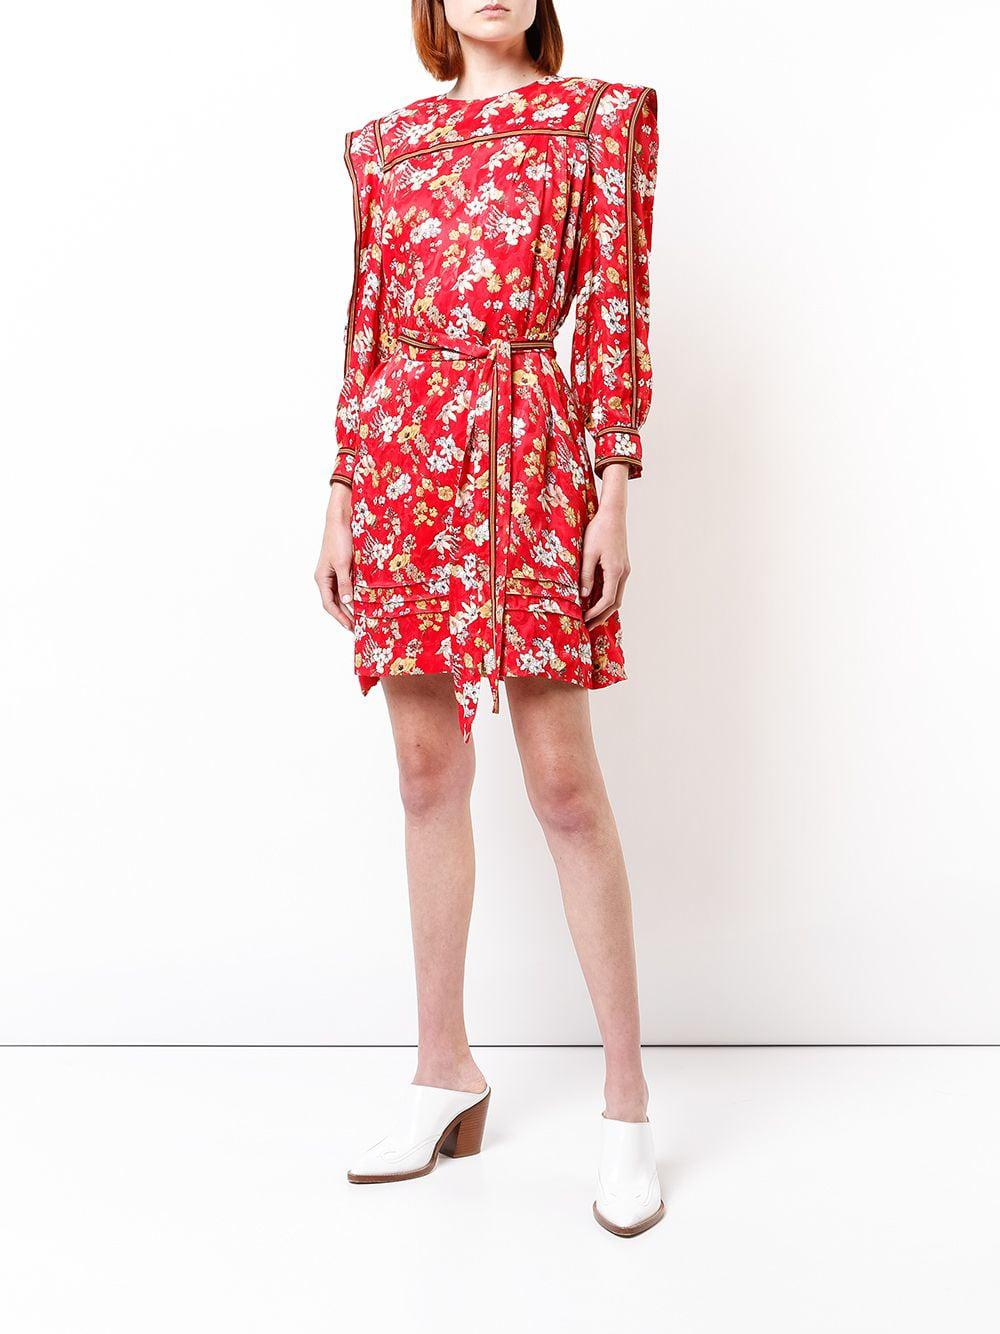 c0b557d1b1 Lyst - 10 Crosby Derek Lam Belted Bouquet Floral Print Silk-blend Jacquard  Shift Dress in Red